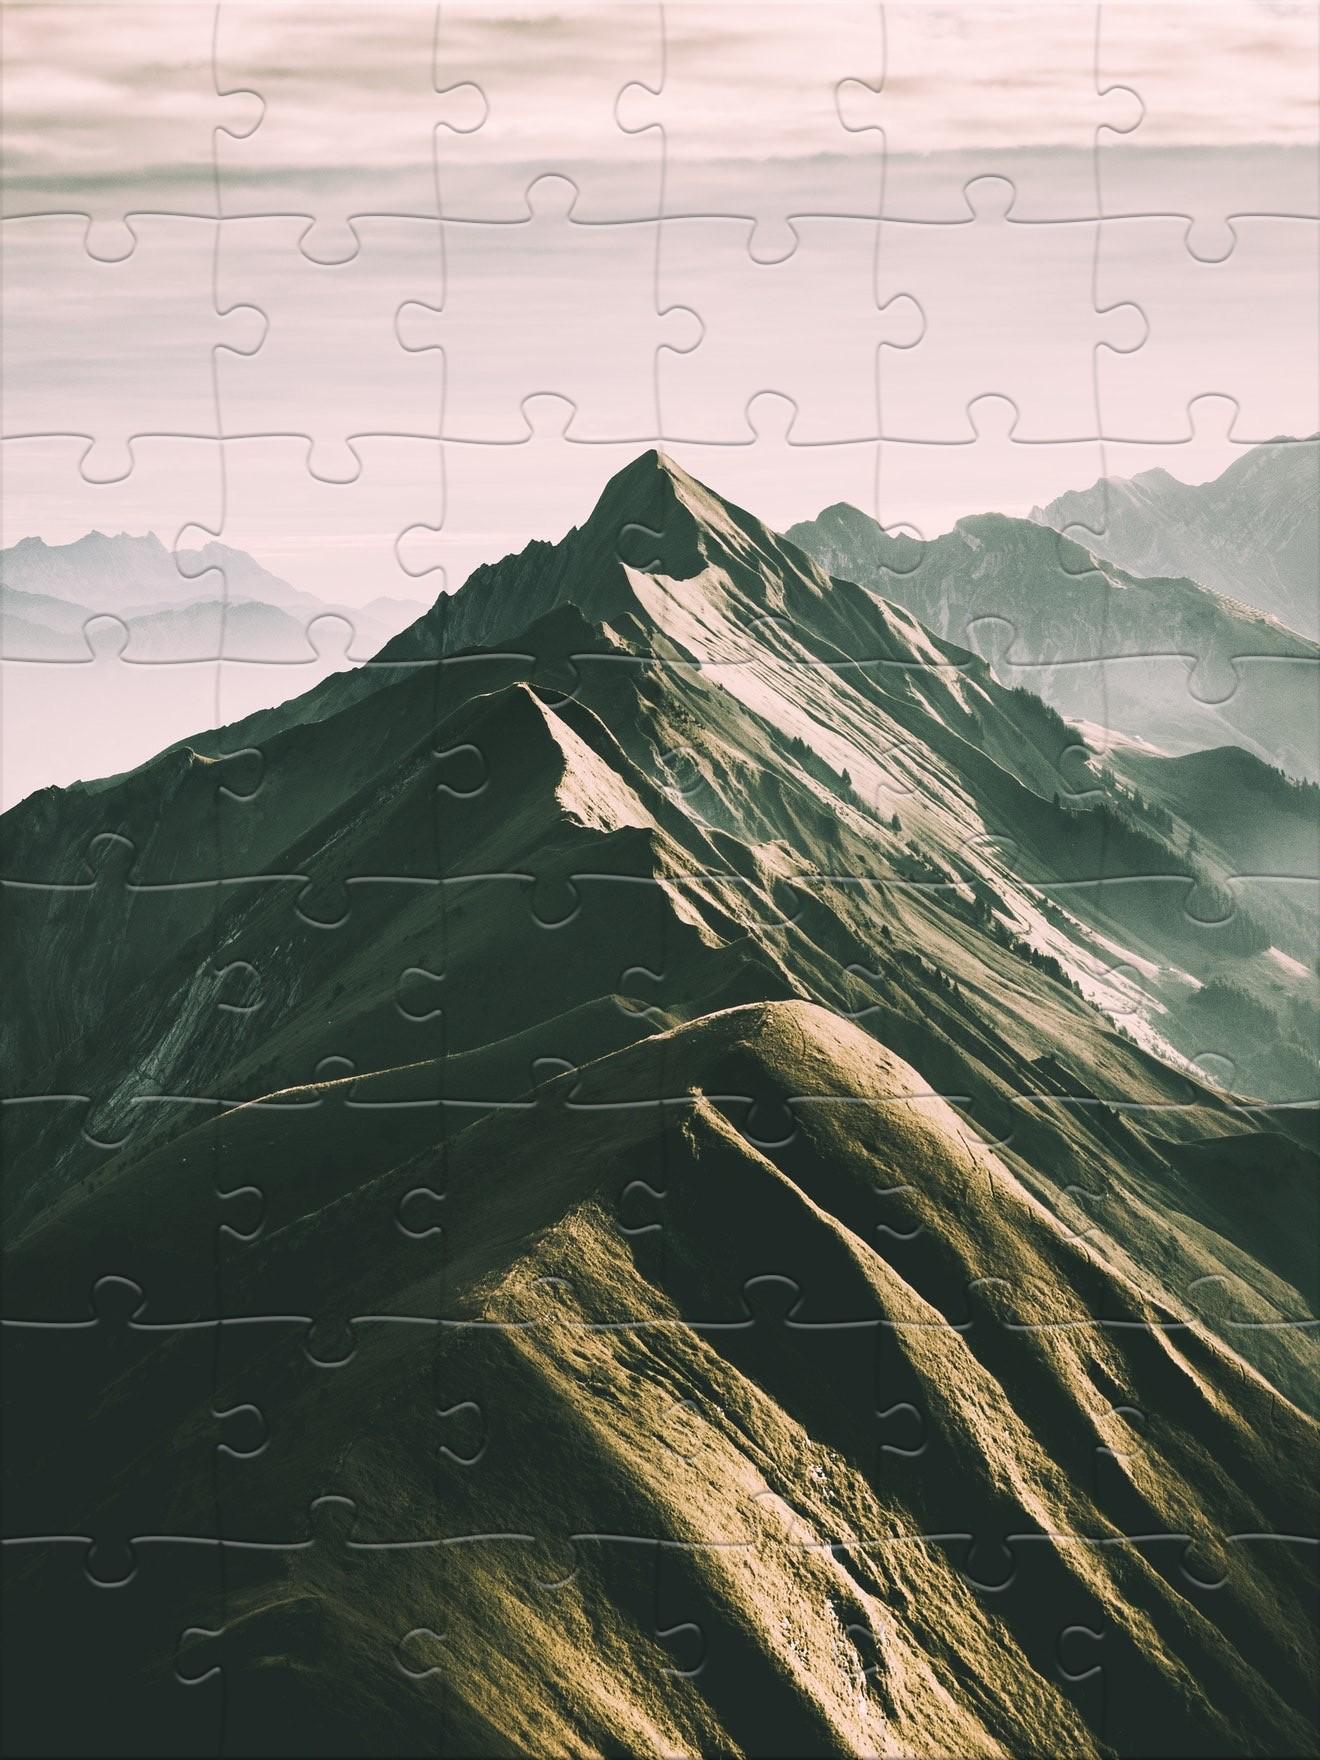 48 Pieces Image